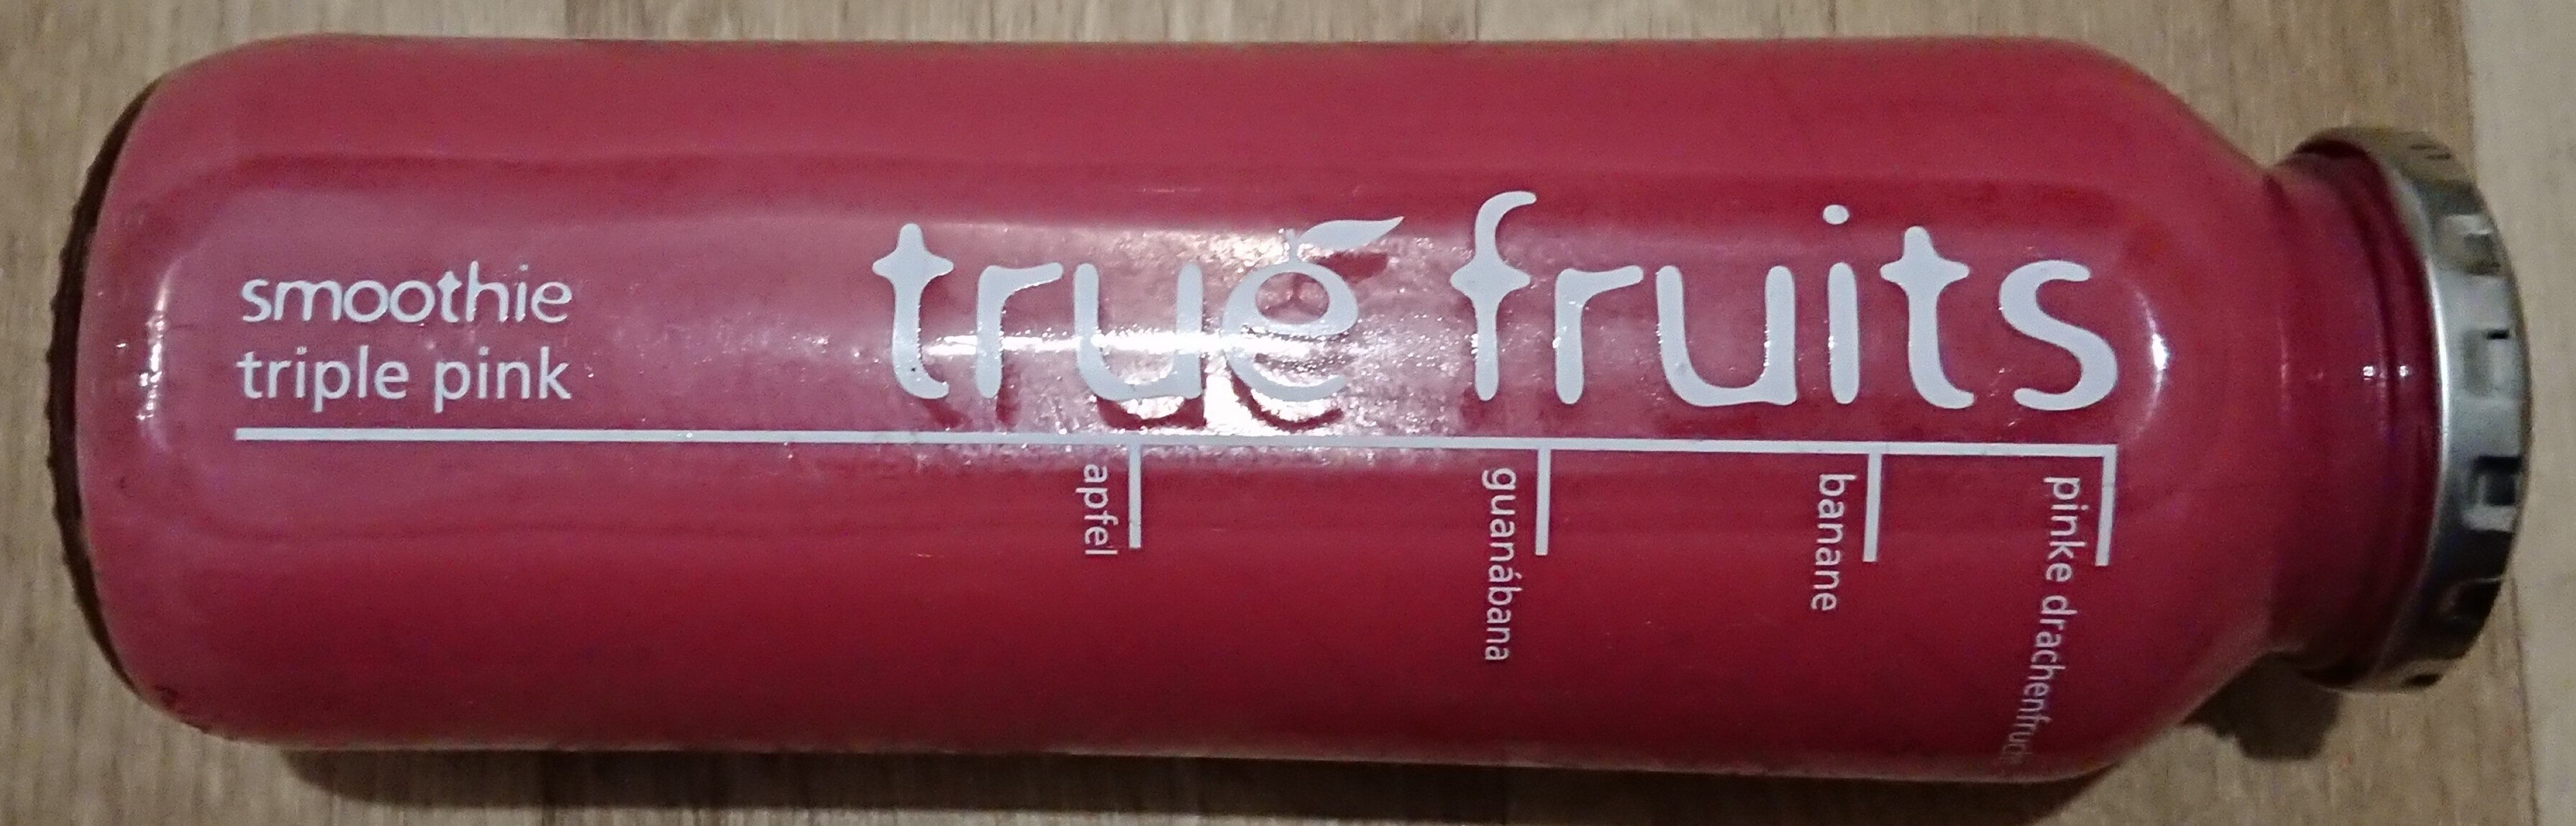 smoothie triple pink - Produkt - de